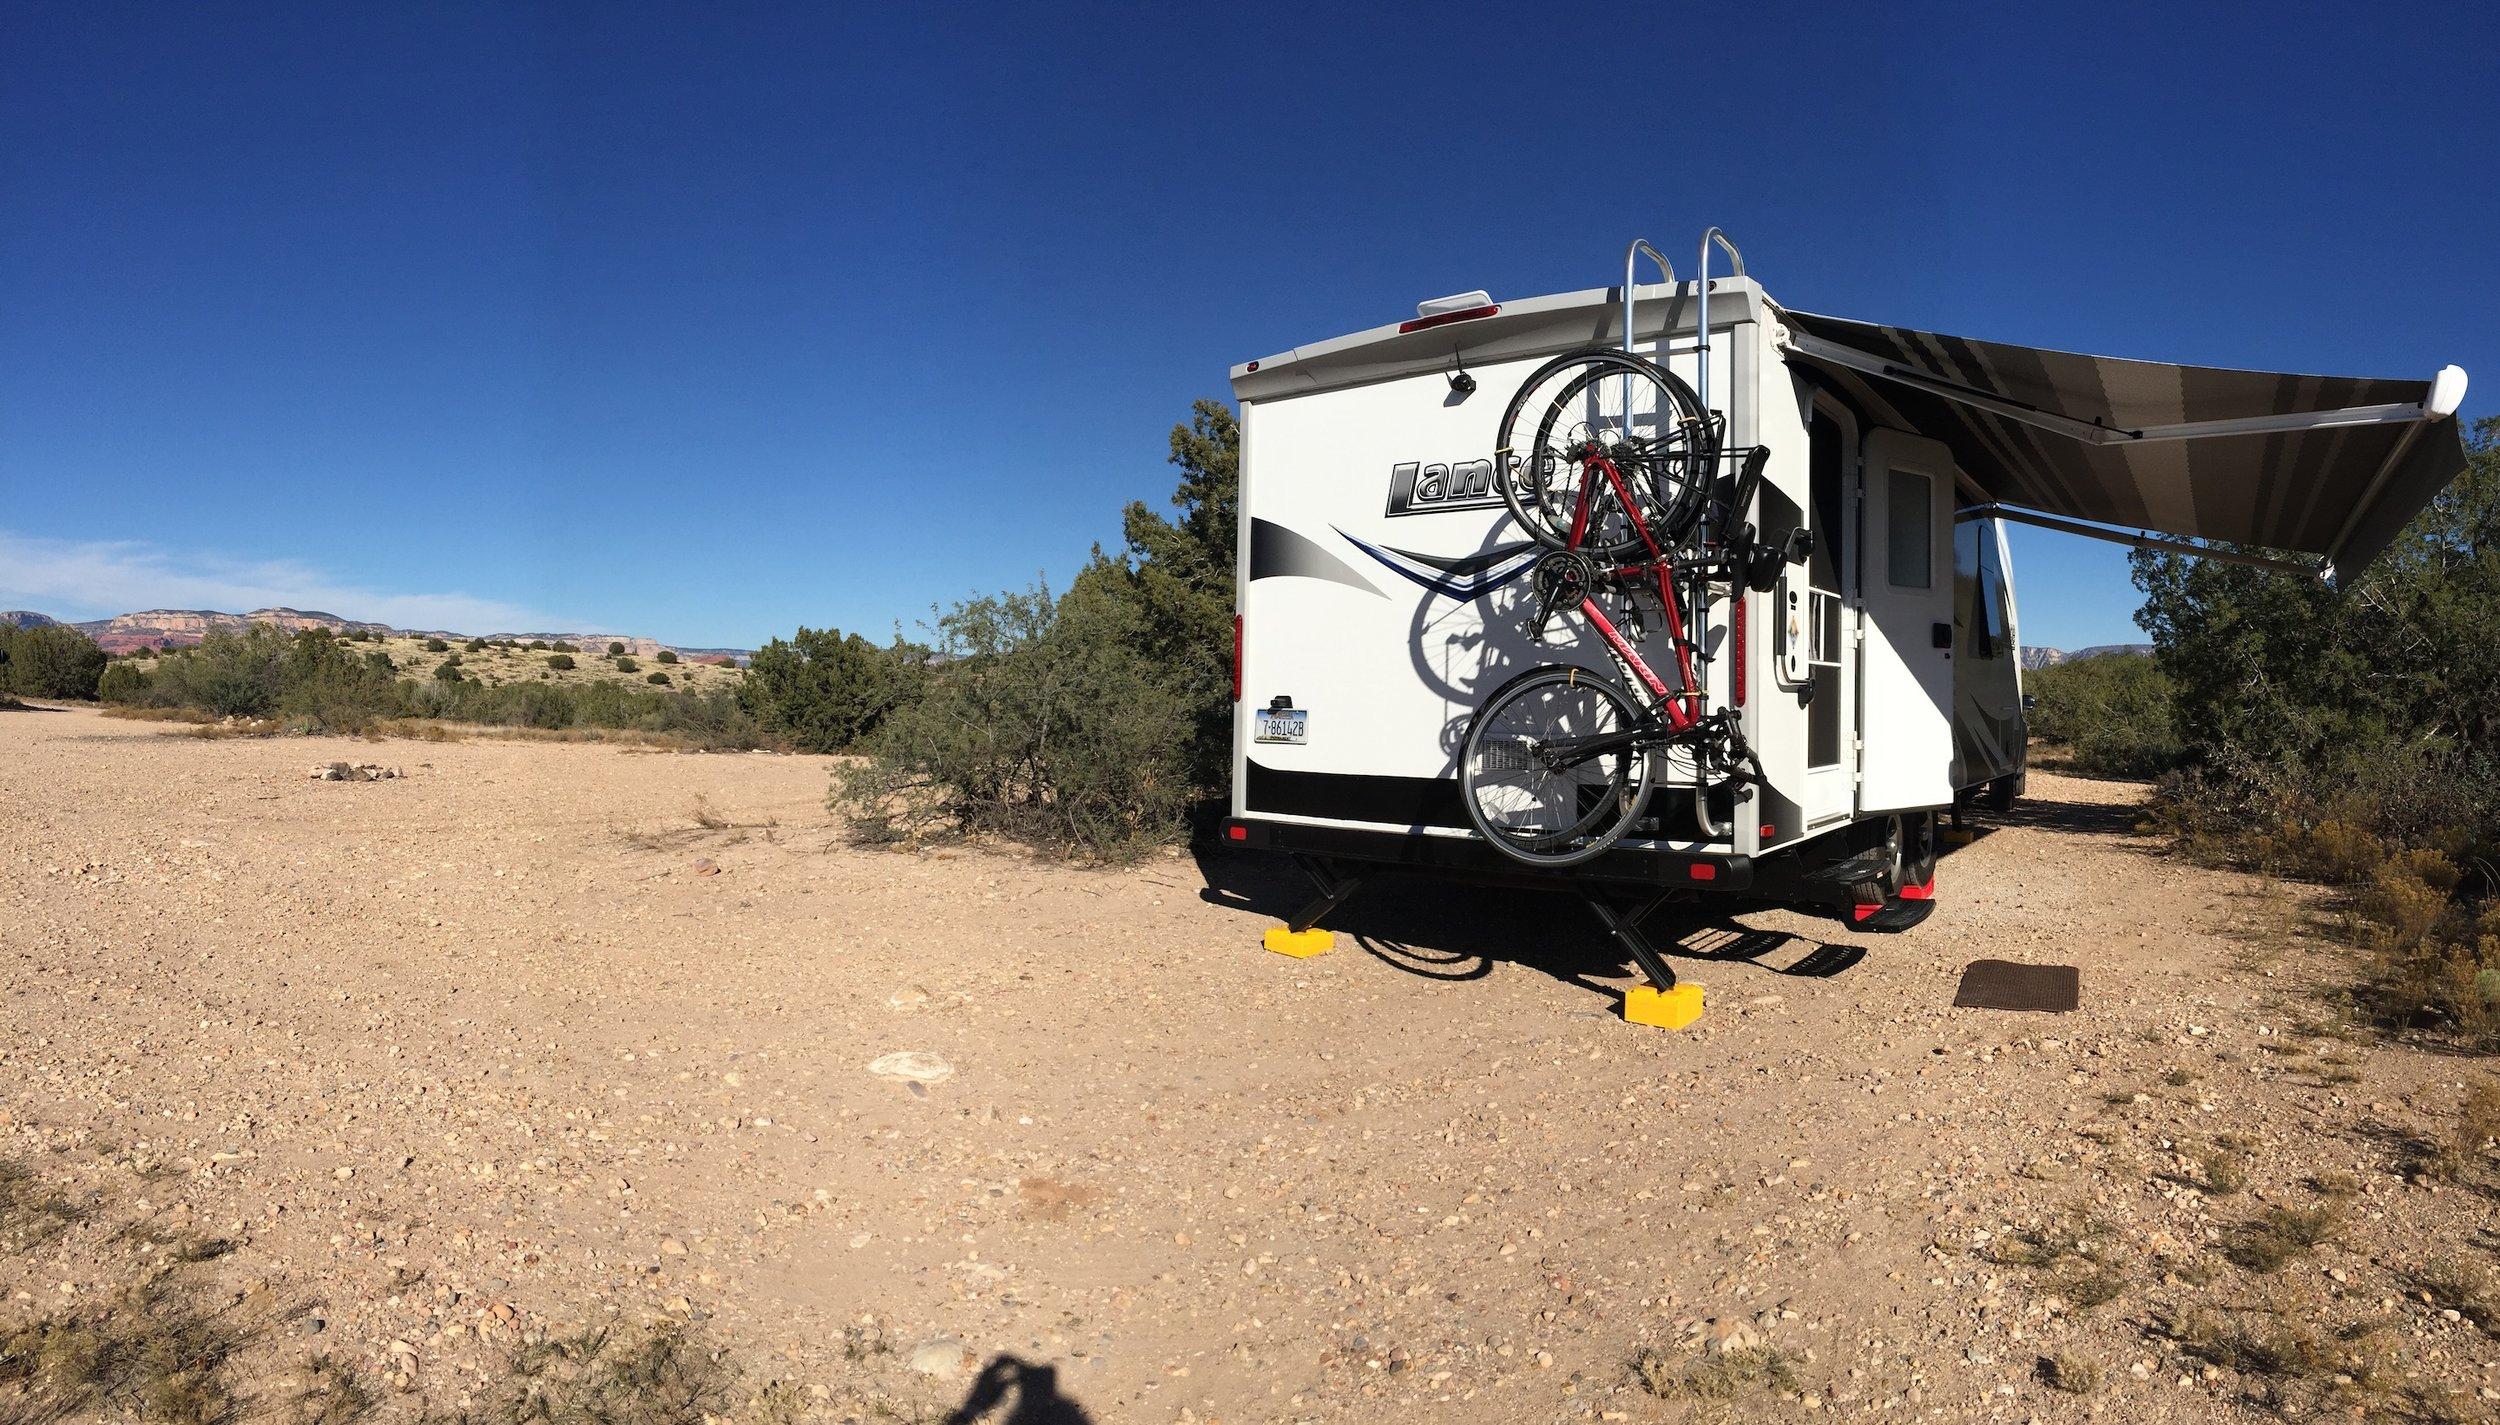 Angel Valley Camping Sedona Arizona